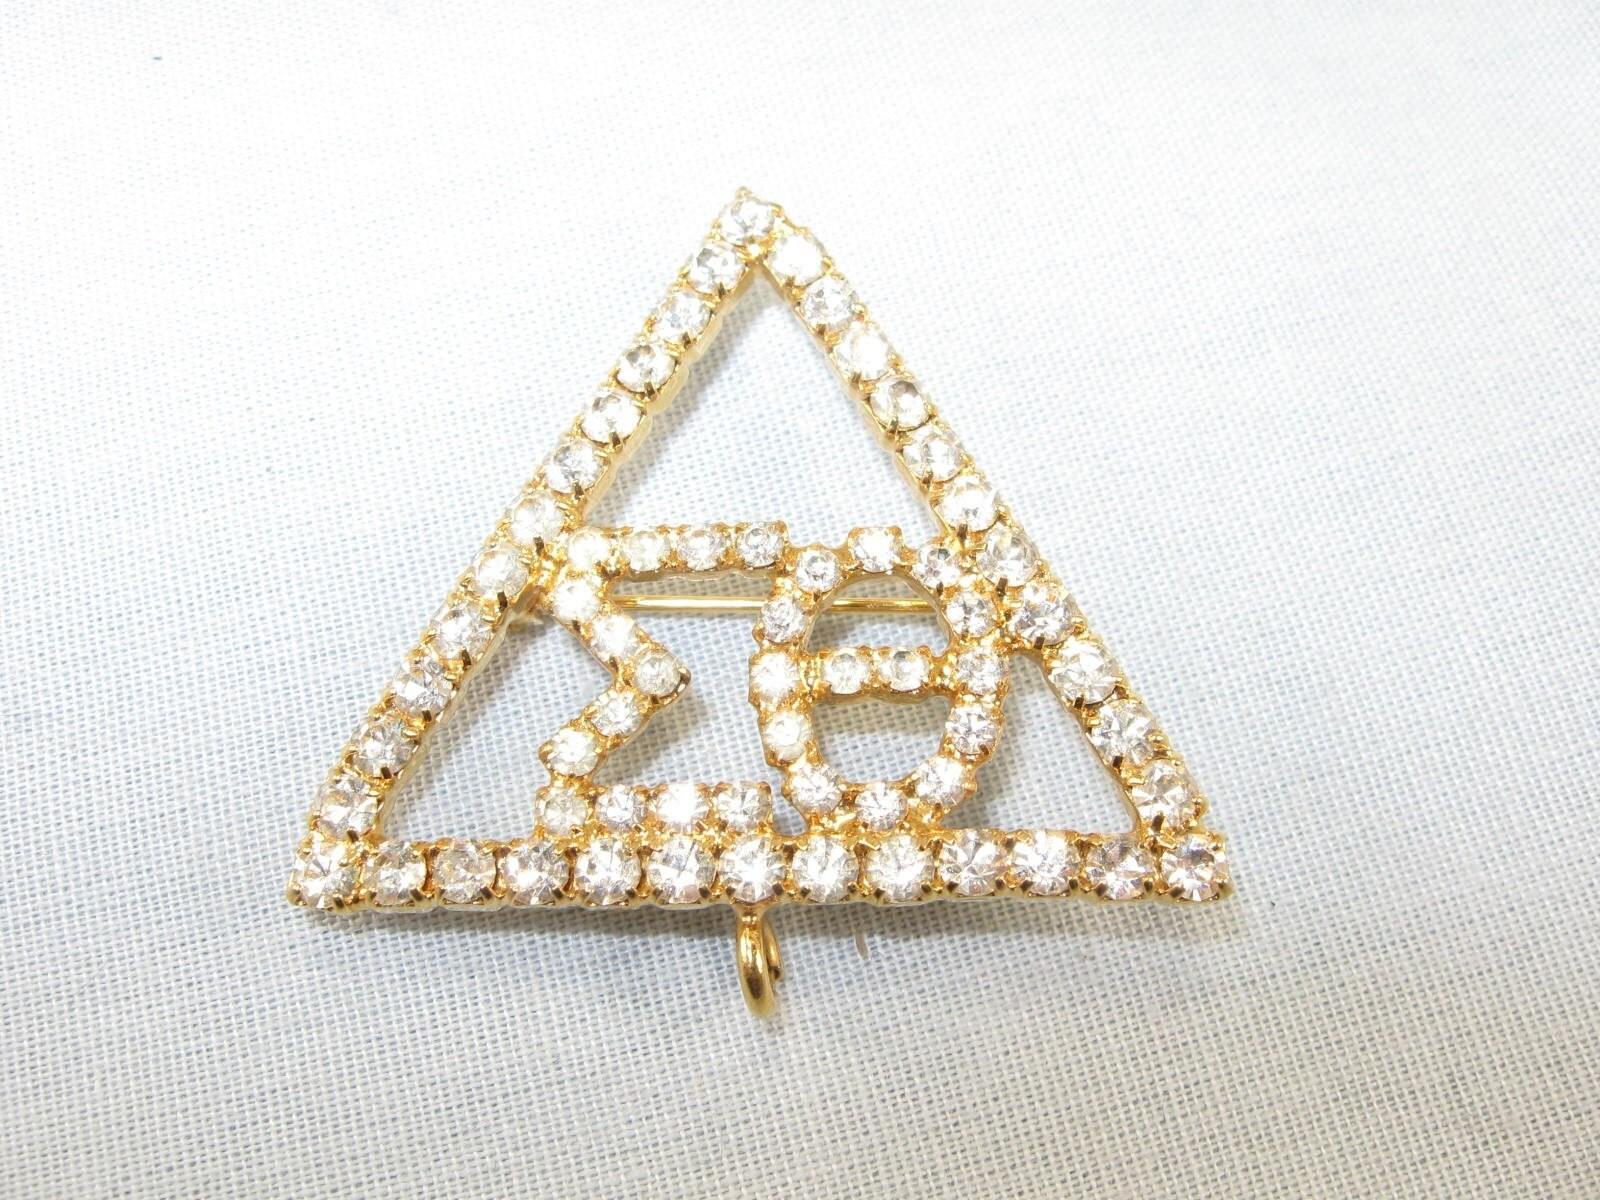 Vintage 60s rhinestone delta sigma theta sorority pin brooch for Delta sigma theta jewelry